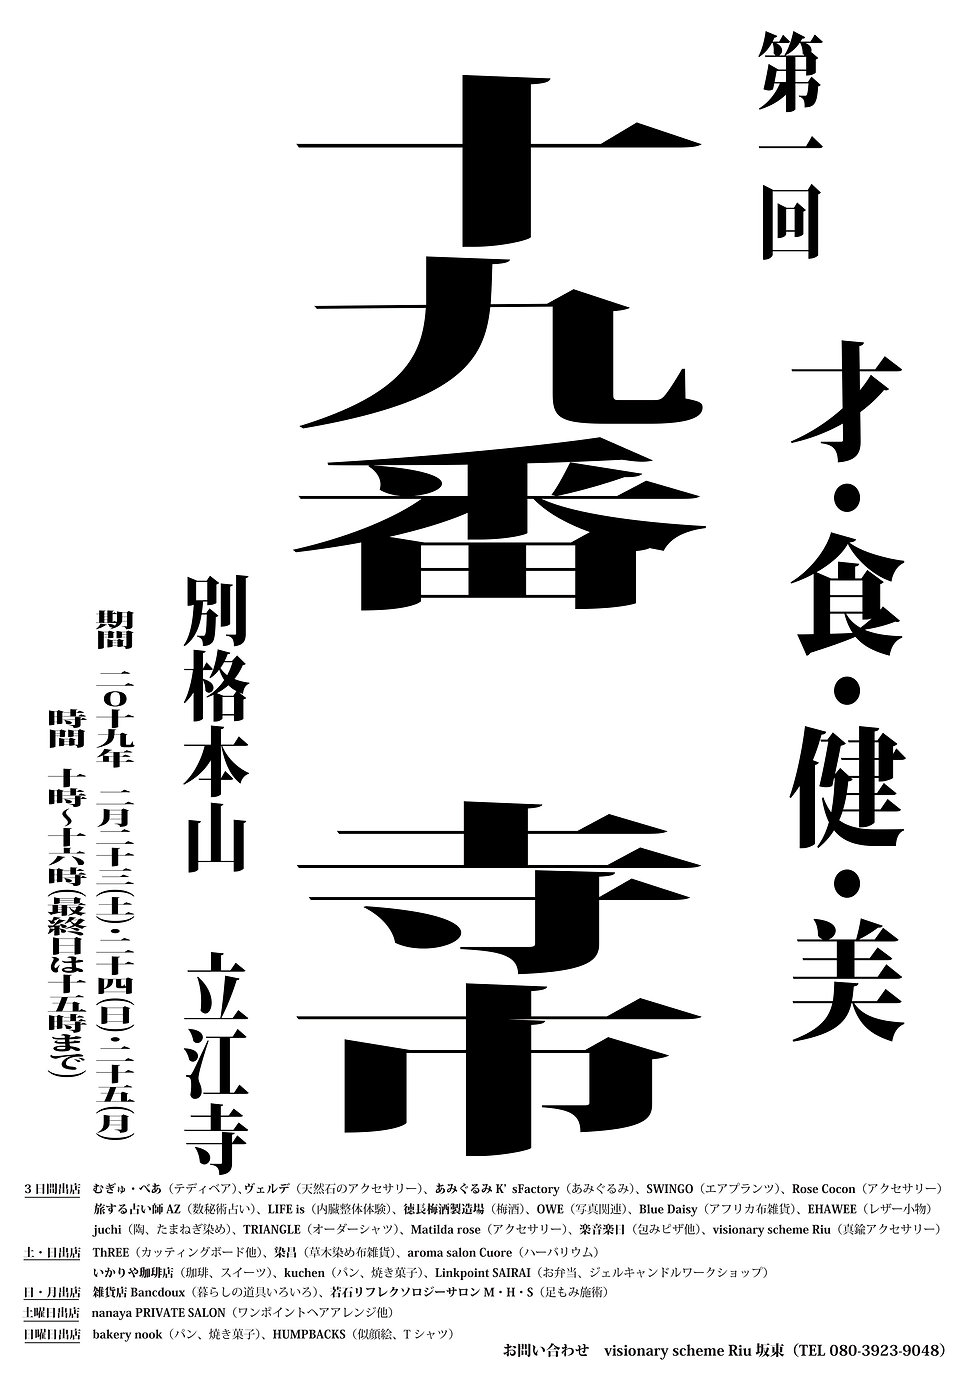 寺市ポスター入稿用(CS2)1-4.jpg